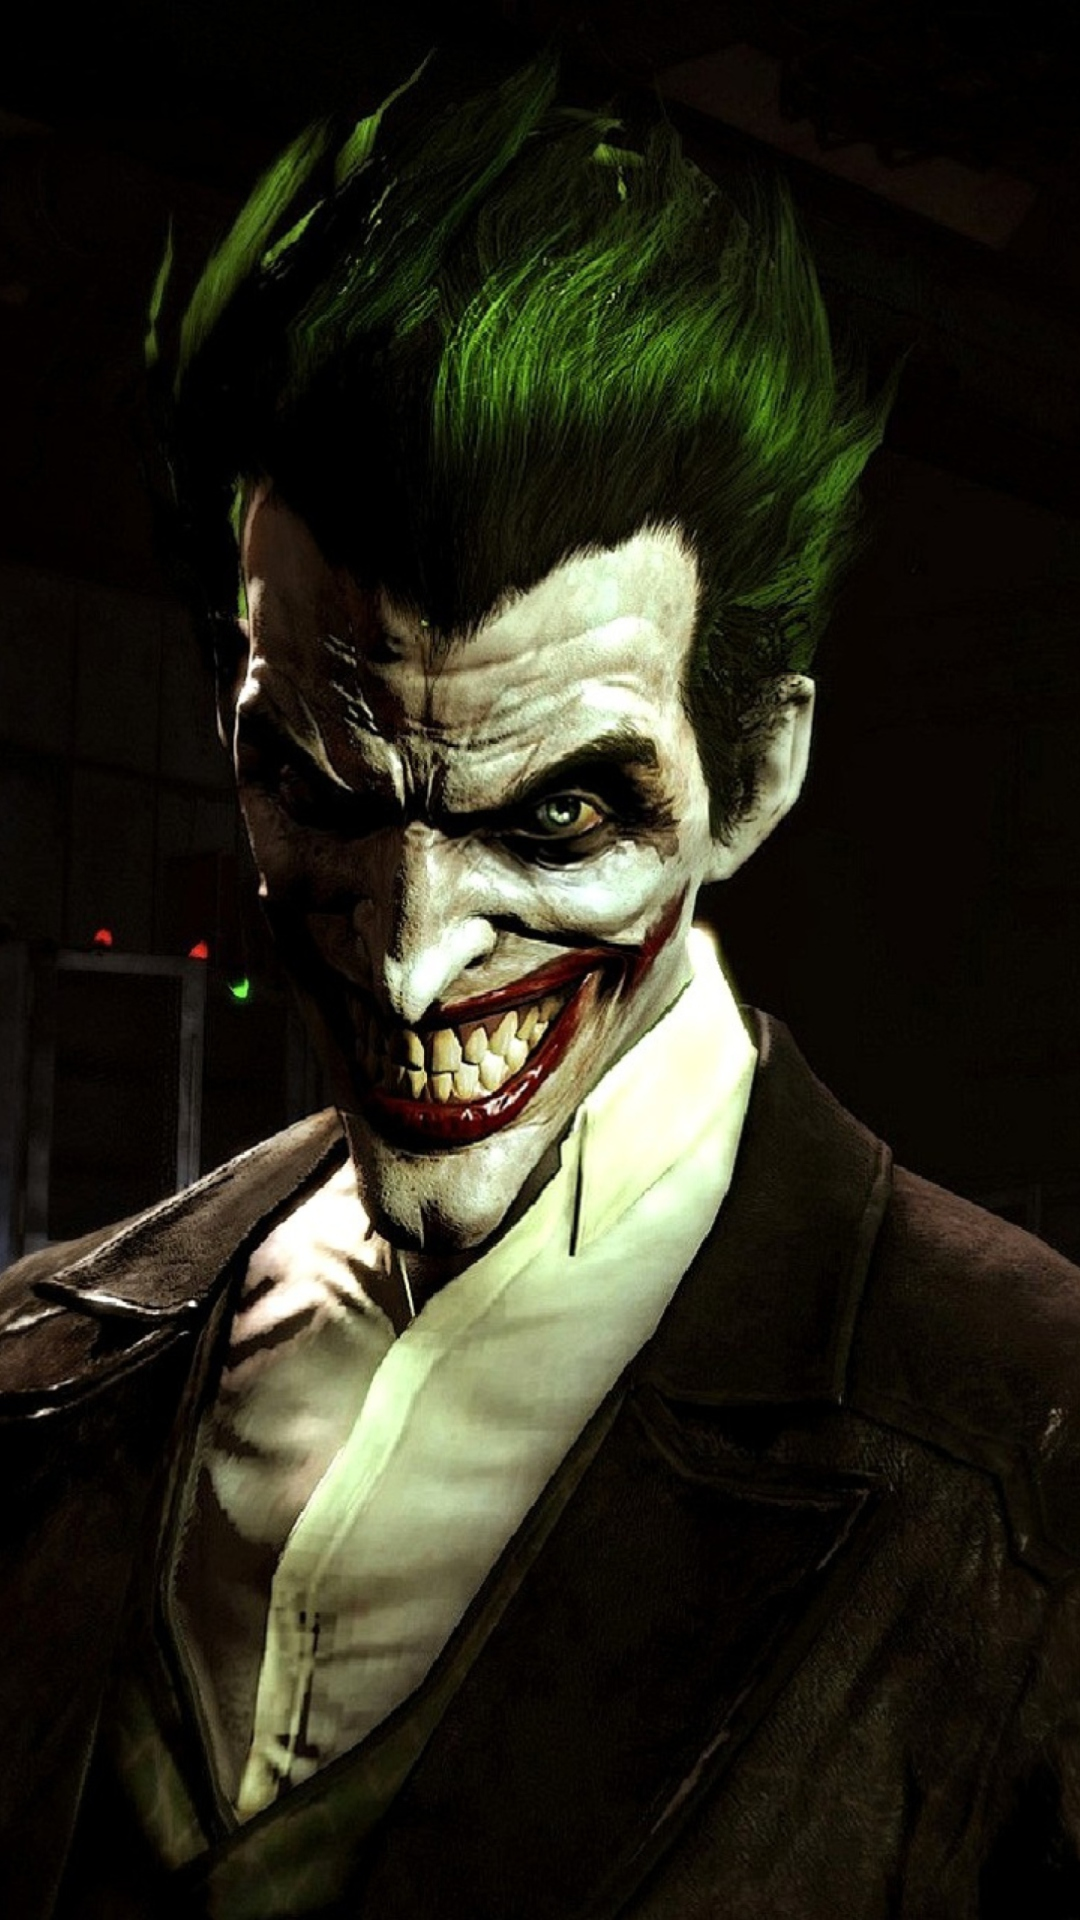 Joker Wallpapers for Iphone 7, Iphone 7 plus, Iphone 6 plus